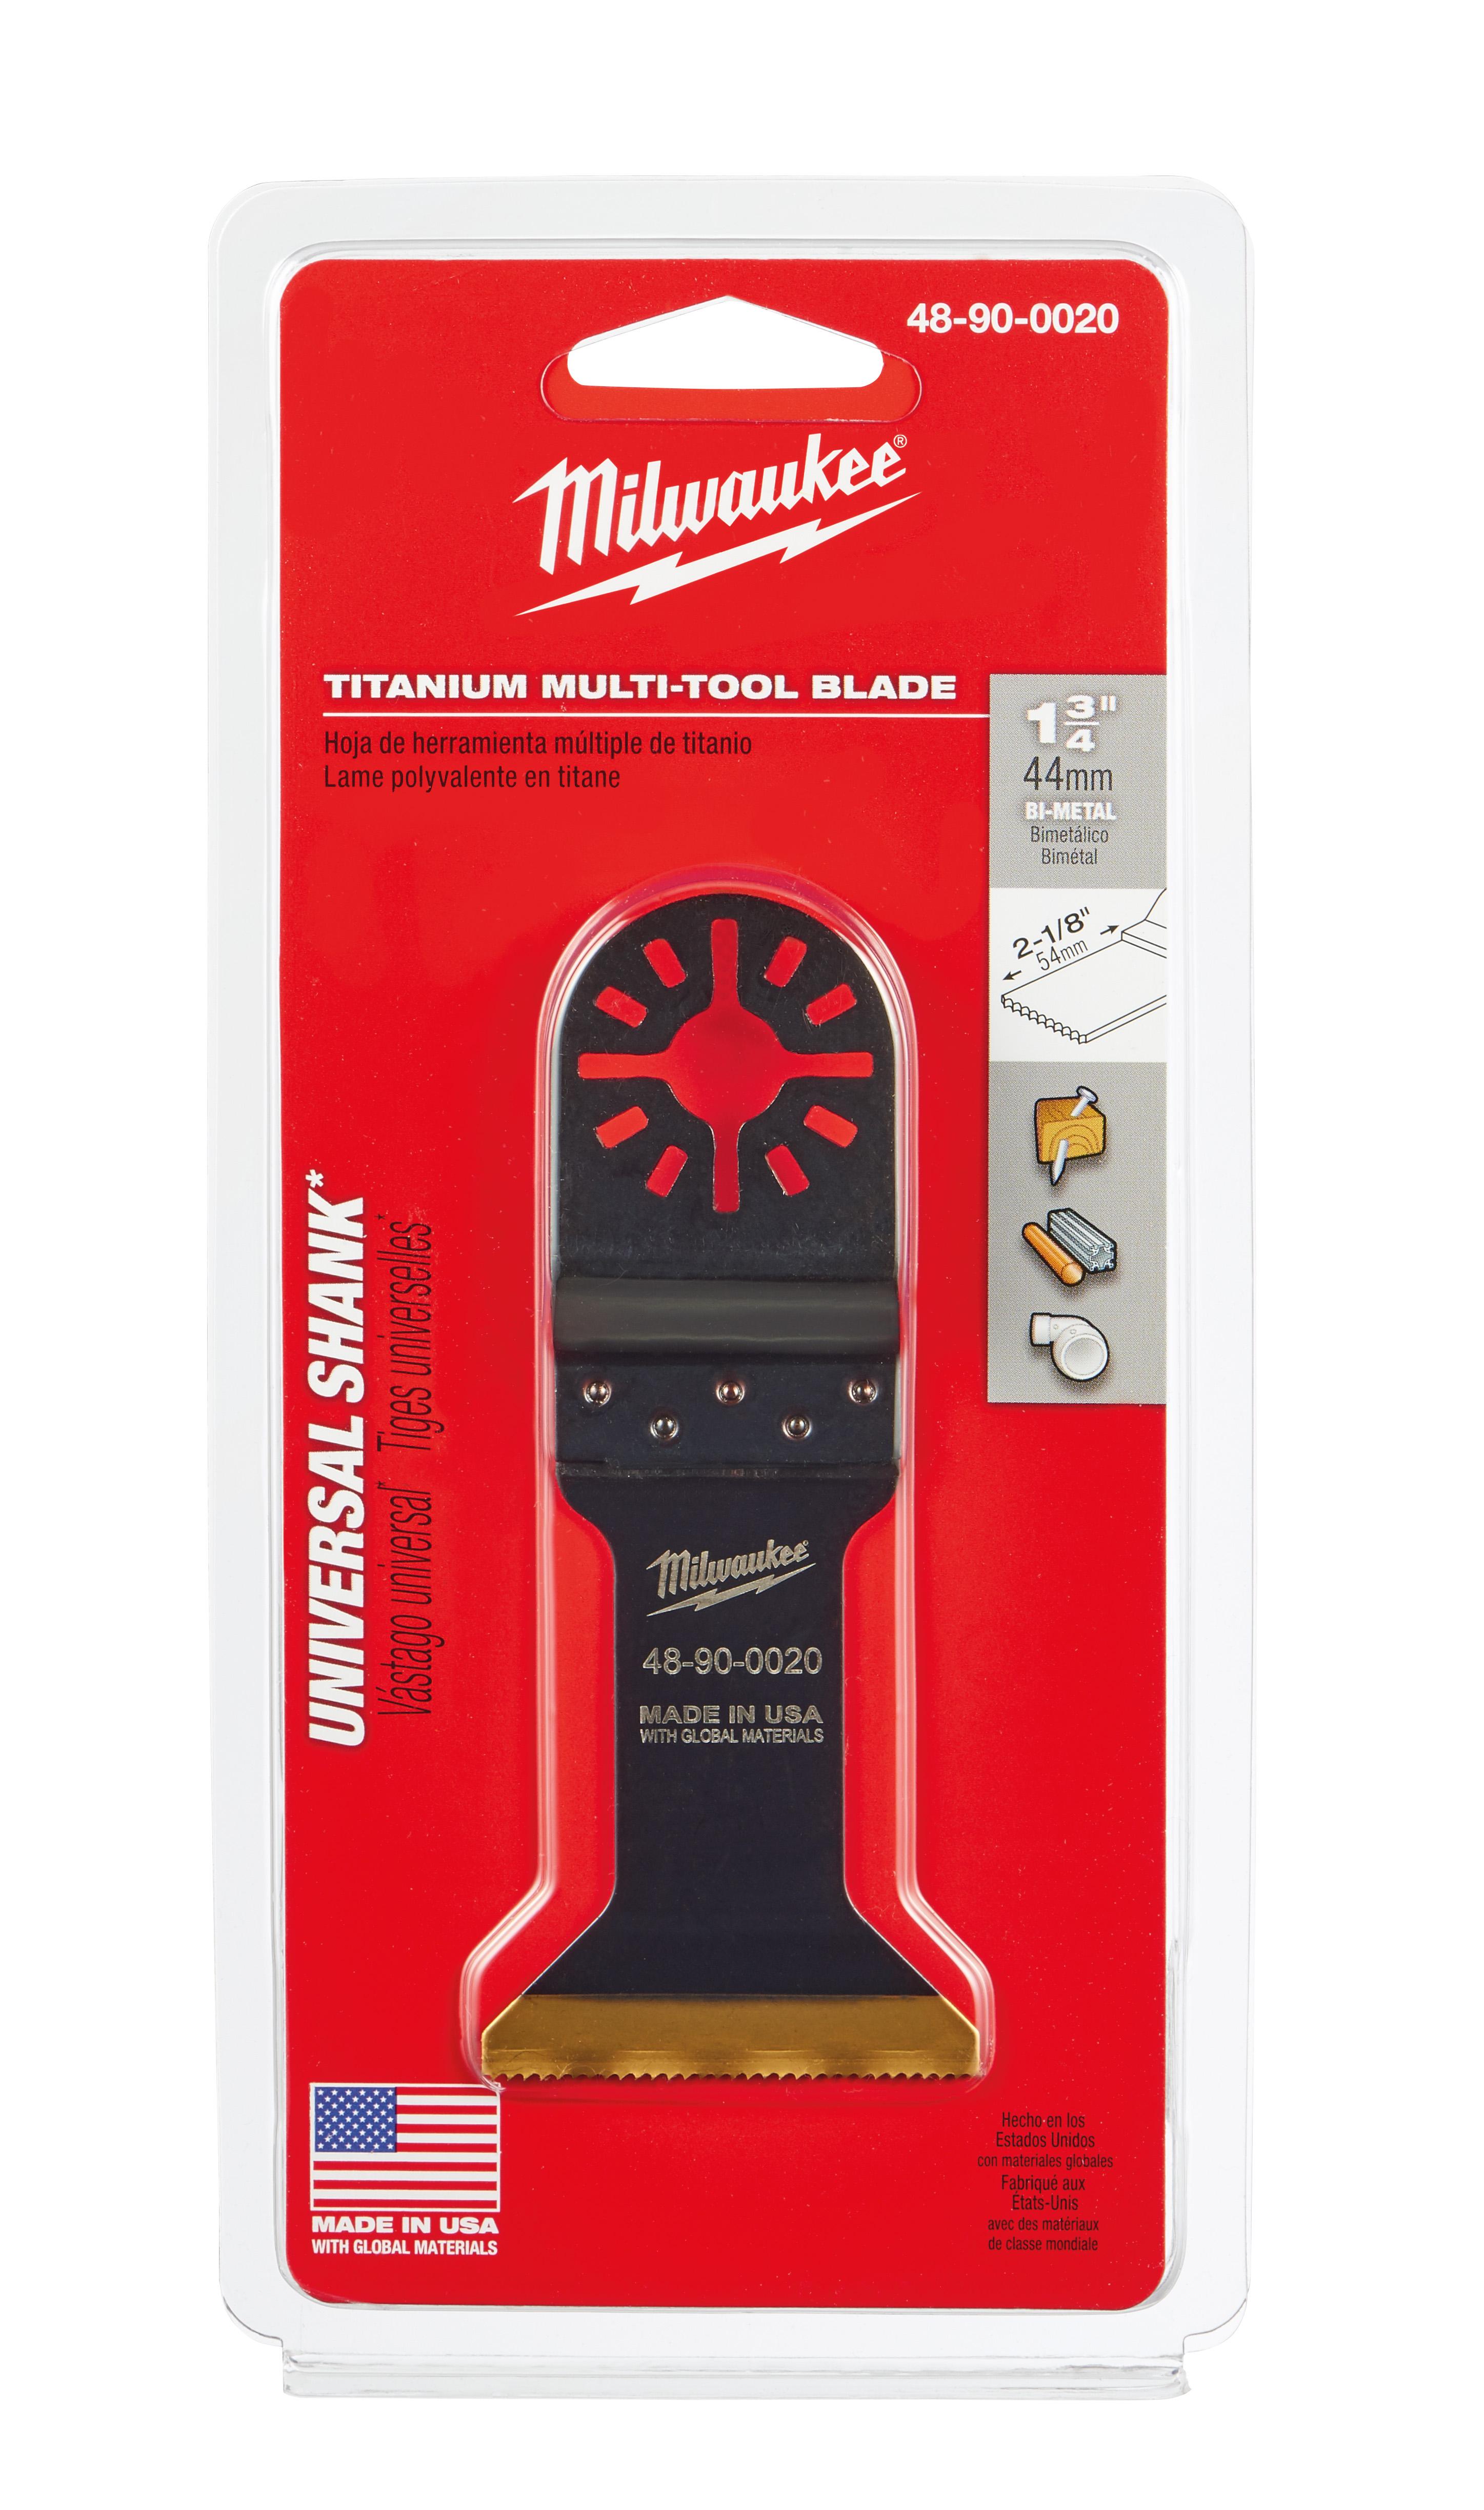 Milwaukee® 48-90-0020 Multi-Tool Blade, For Use With Oscillating Tool, 1-3/4 in Dia Cutting, Bi-Metal